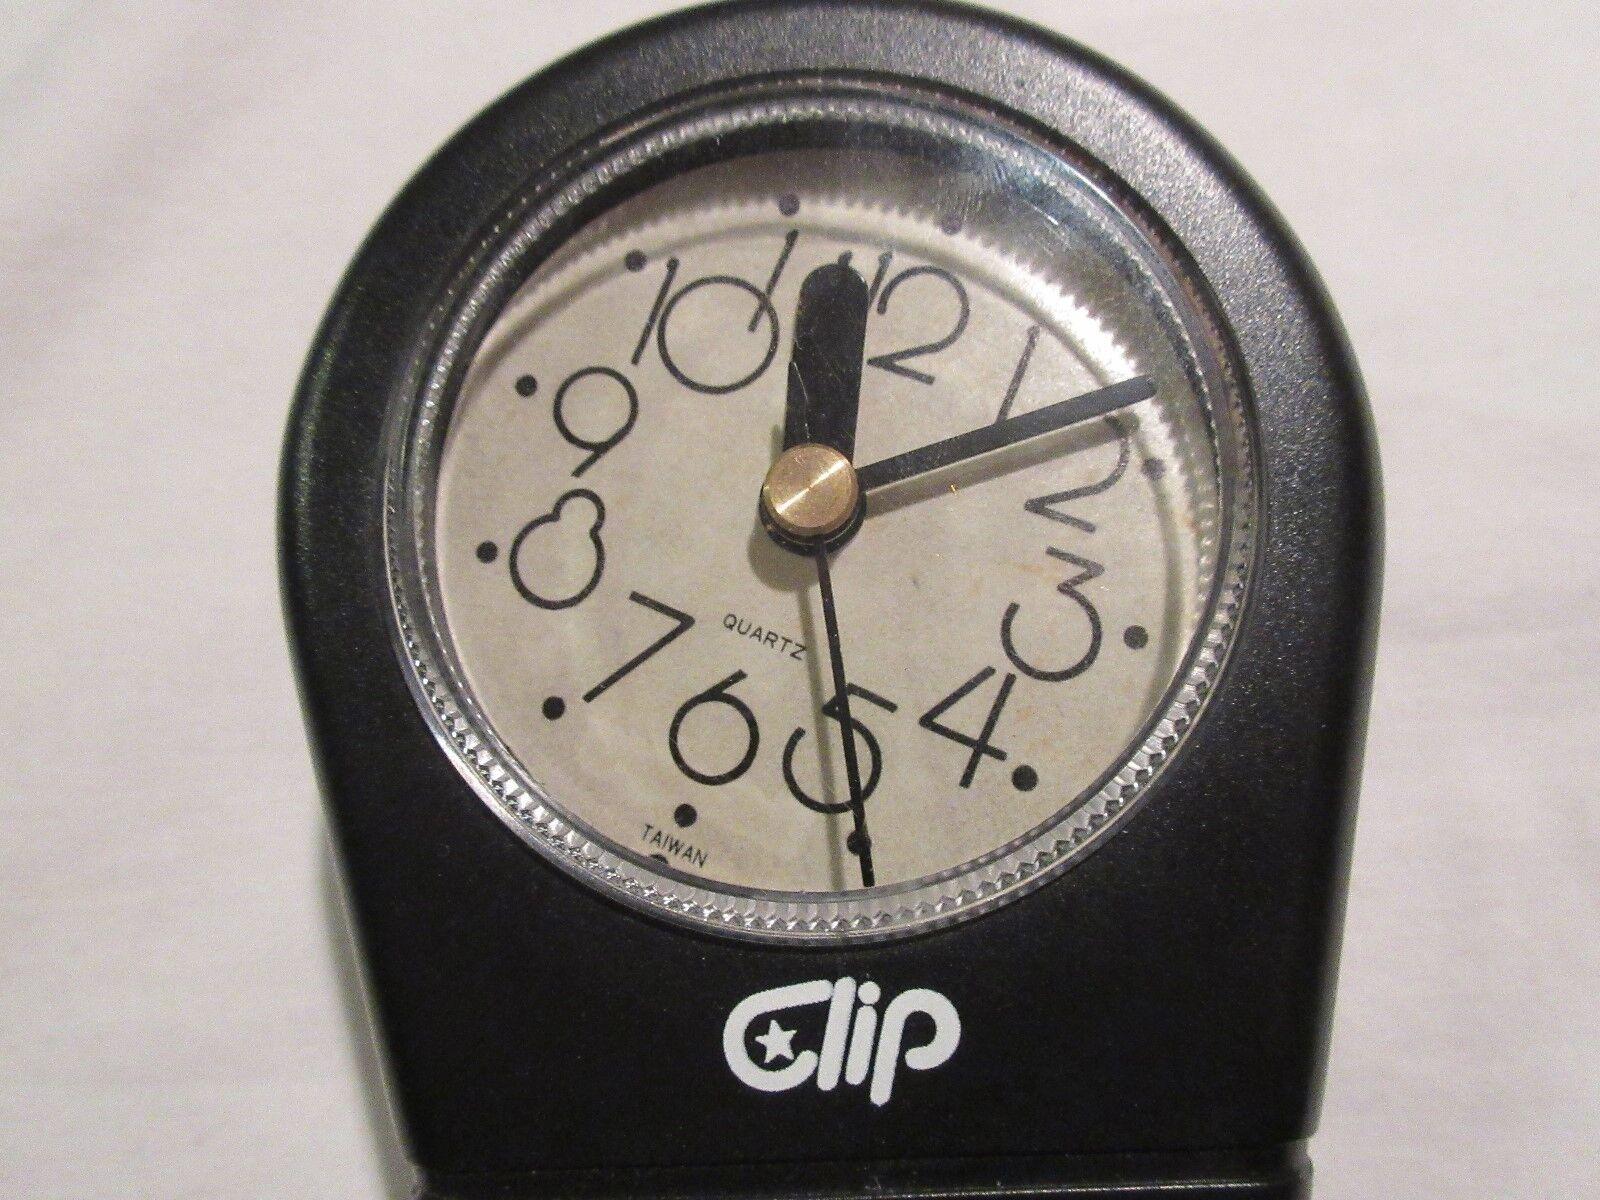 """Clip"", Clock and Big Paperclip Combination"